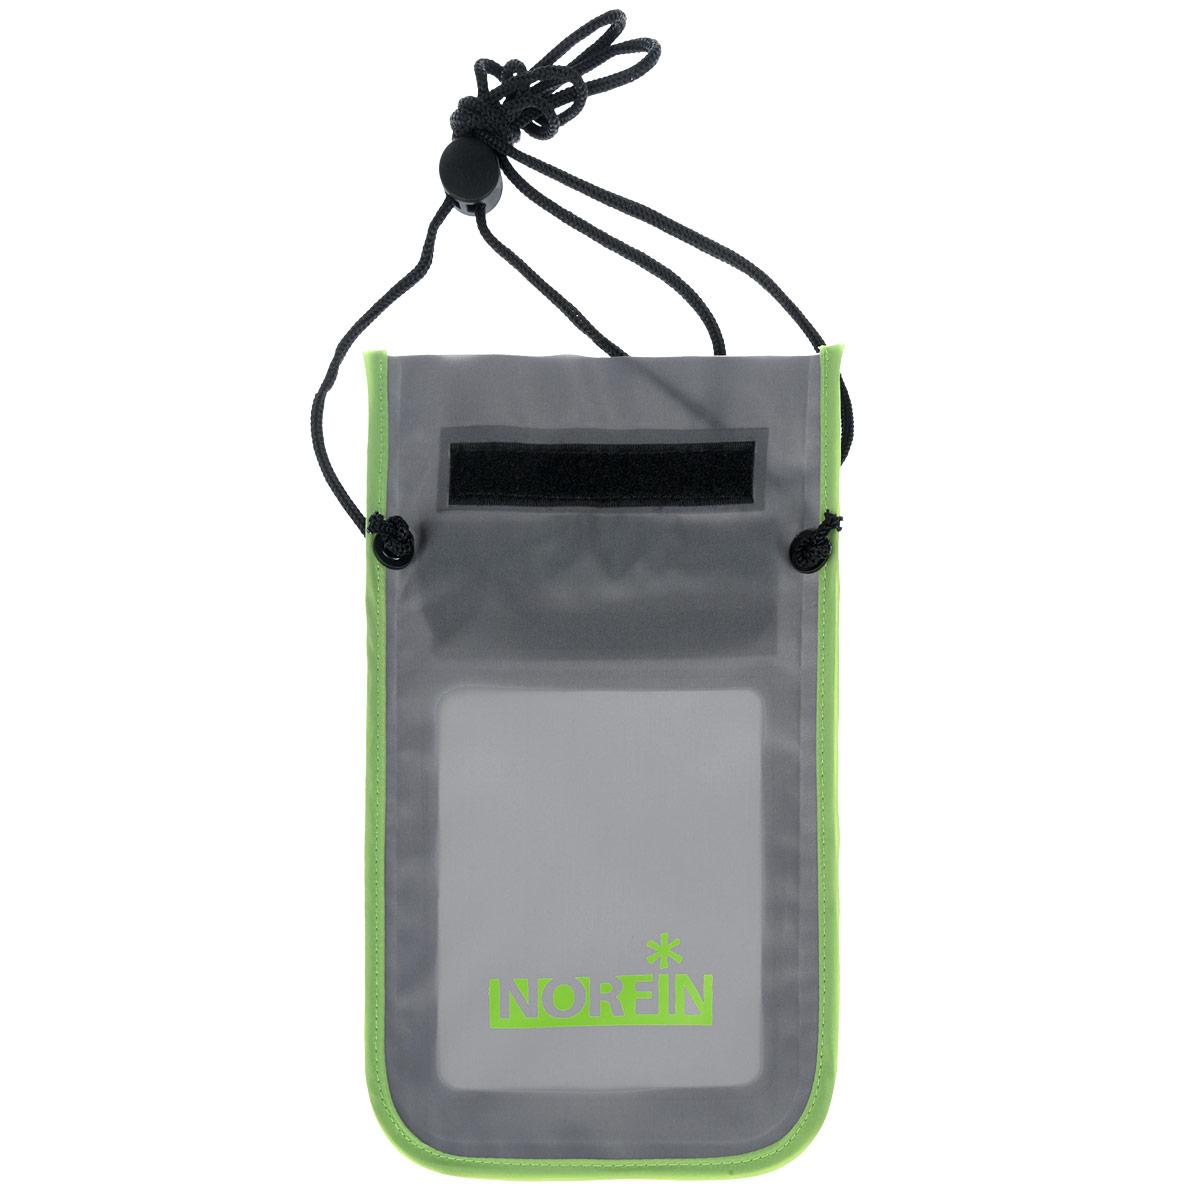 Гермочехол Norfin Dry Case 01, цвет: серый, салатовый, 25 см х 15 см сумка norfin dry case 02 nf 40307